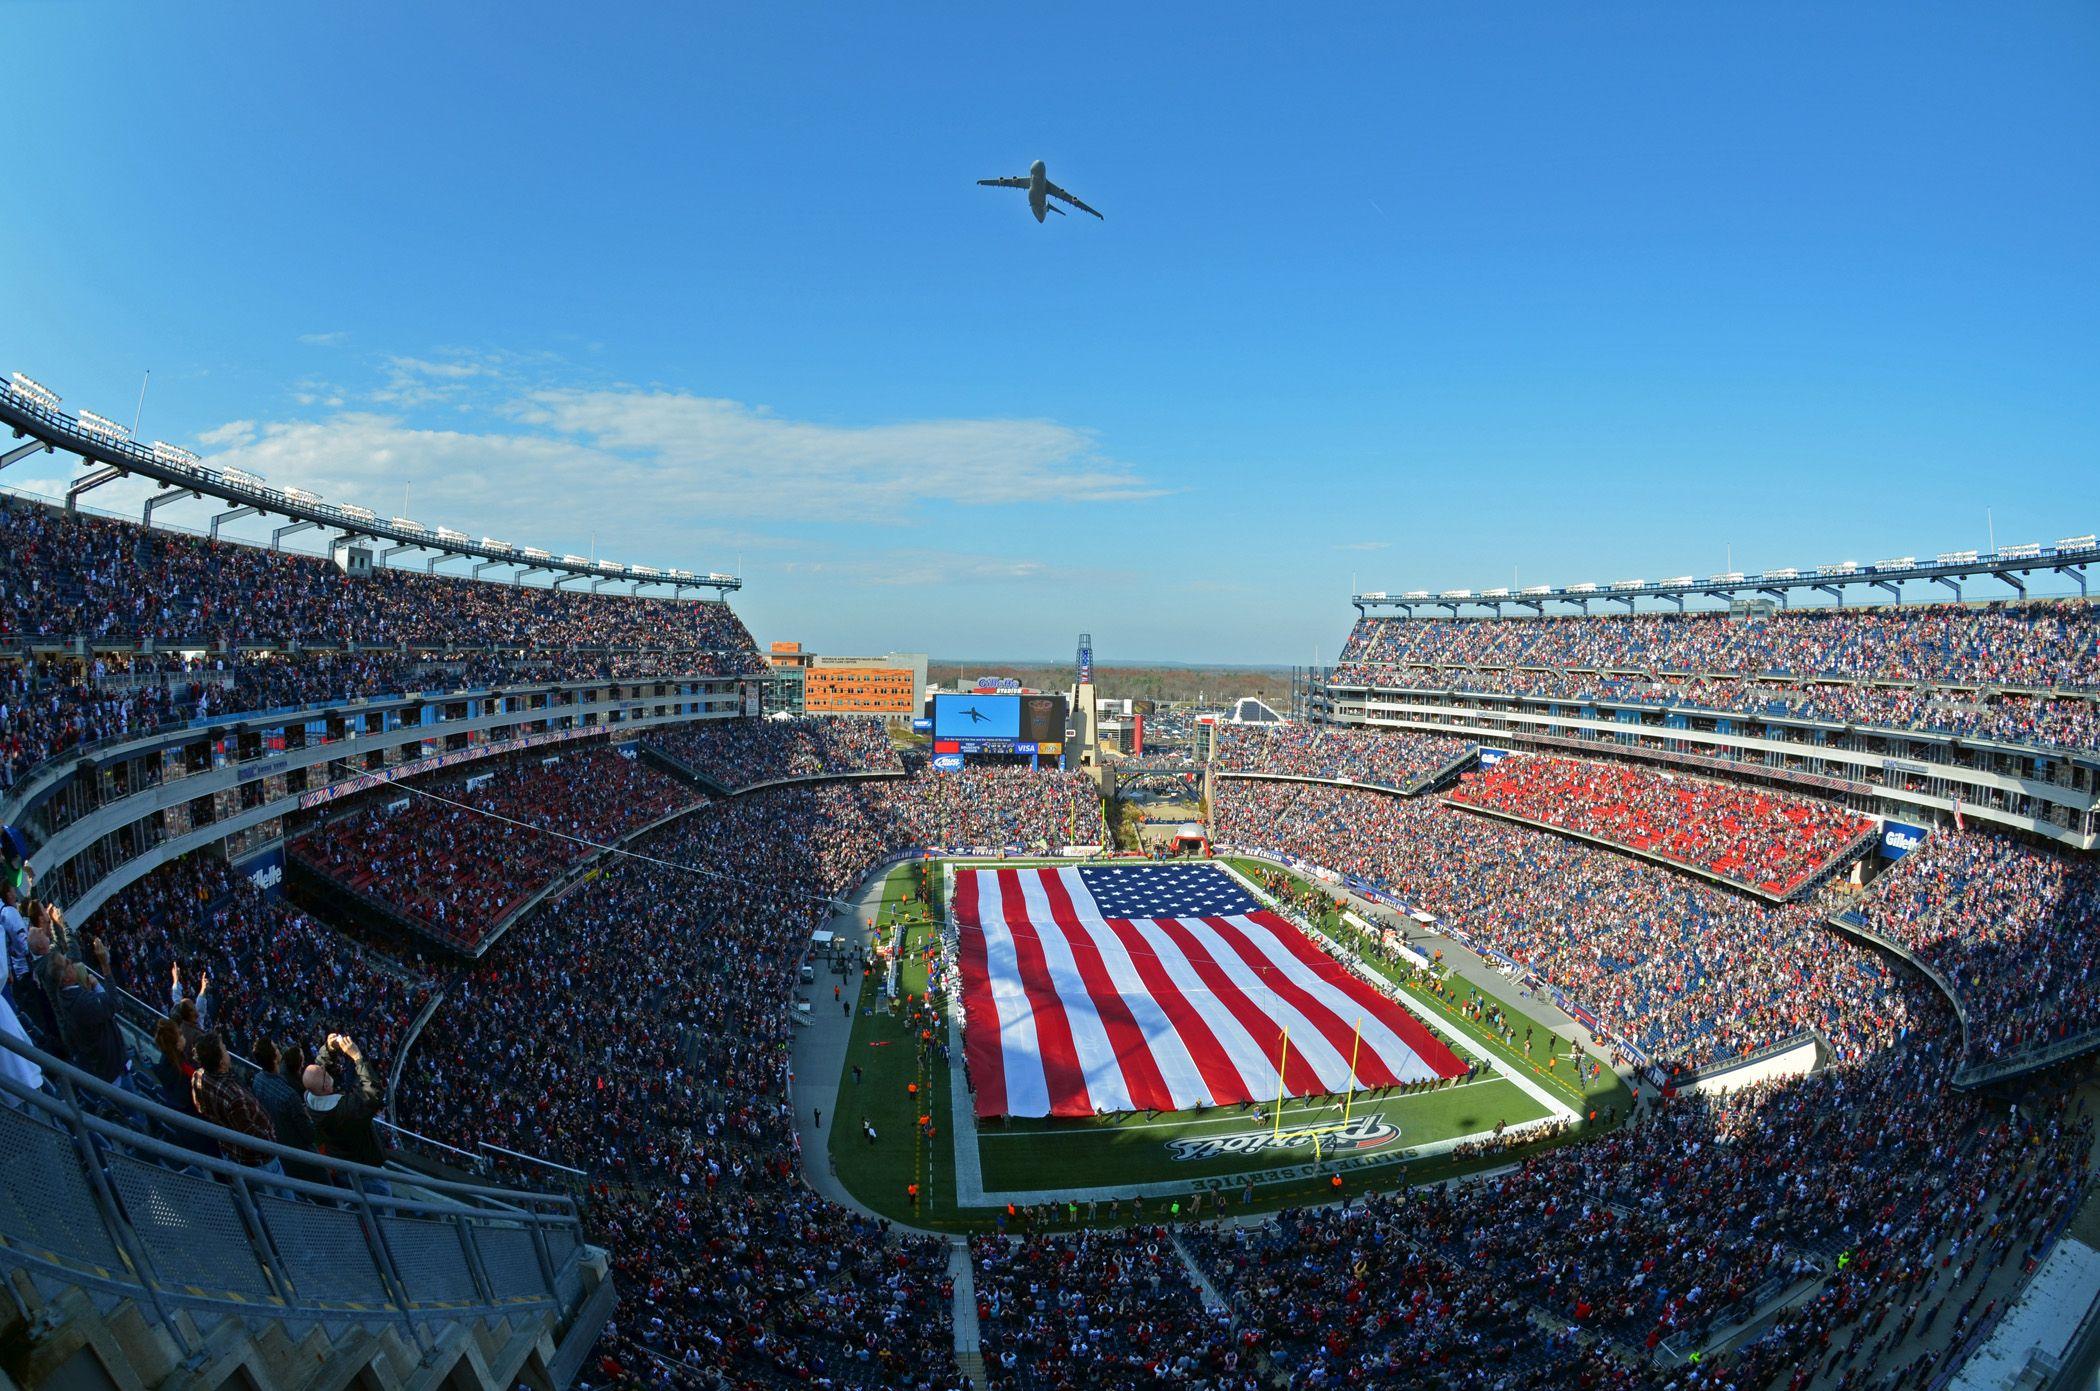 Épinglé par Nicole WesawNewland sur New England Patriots